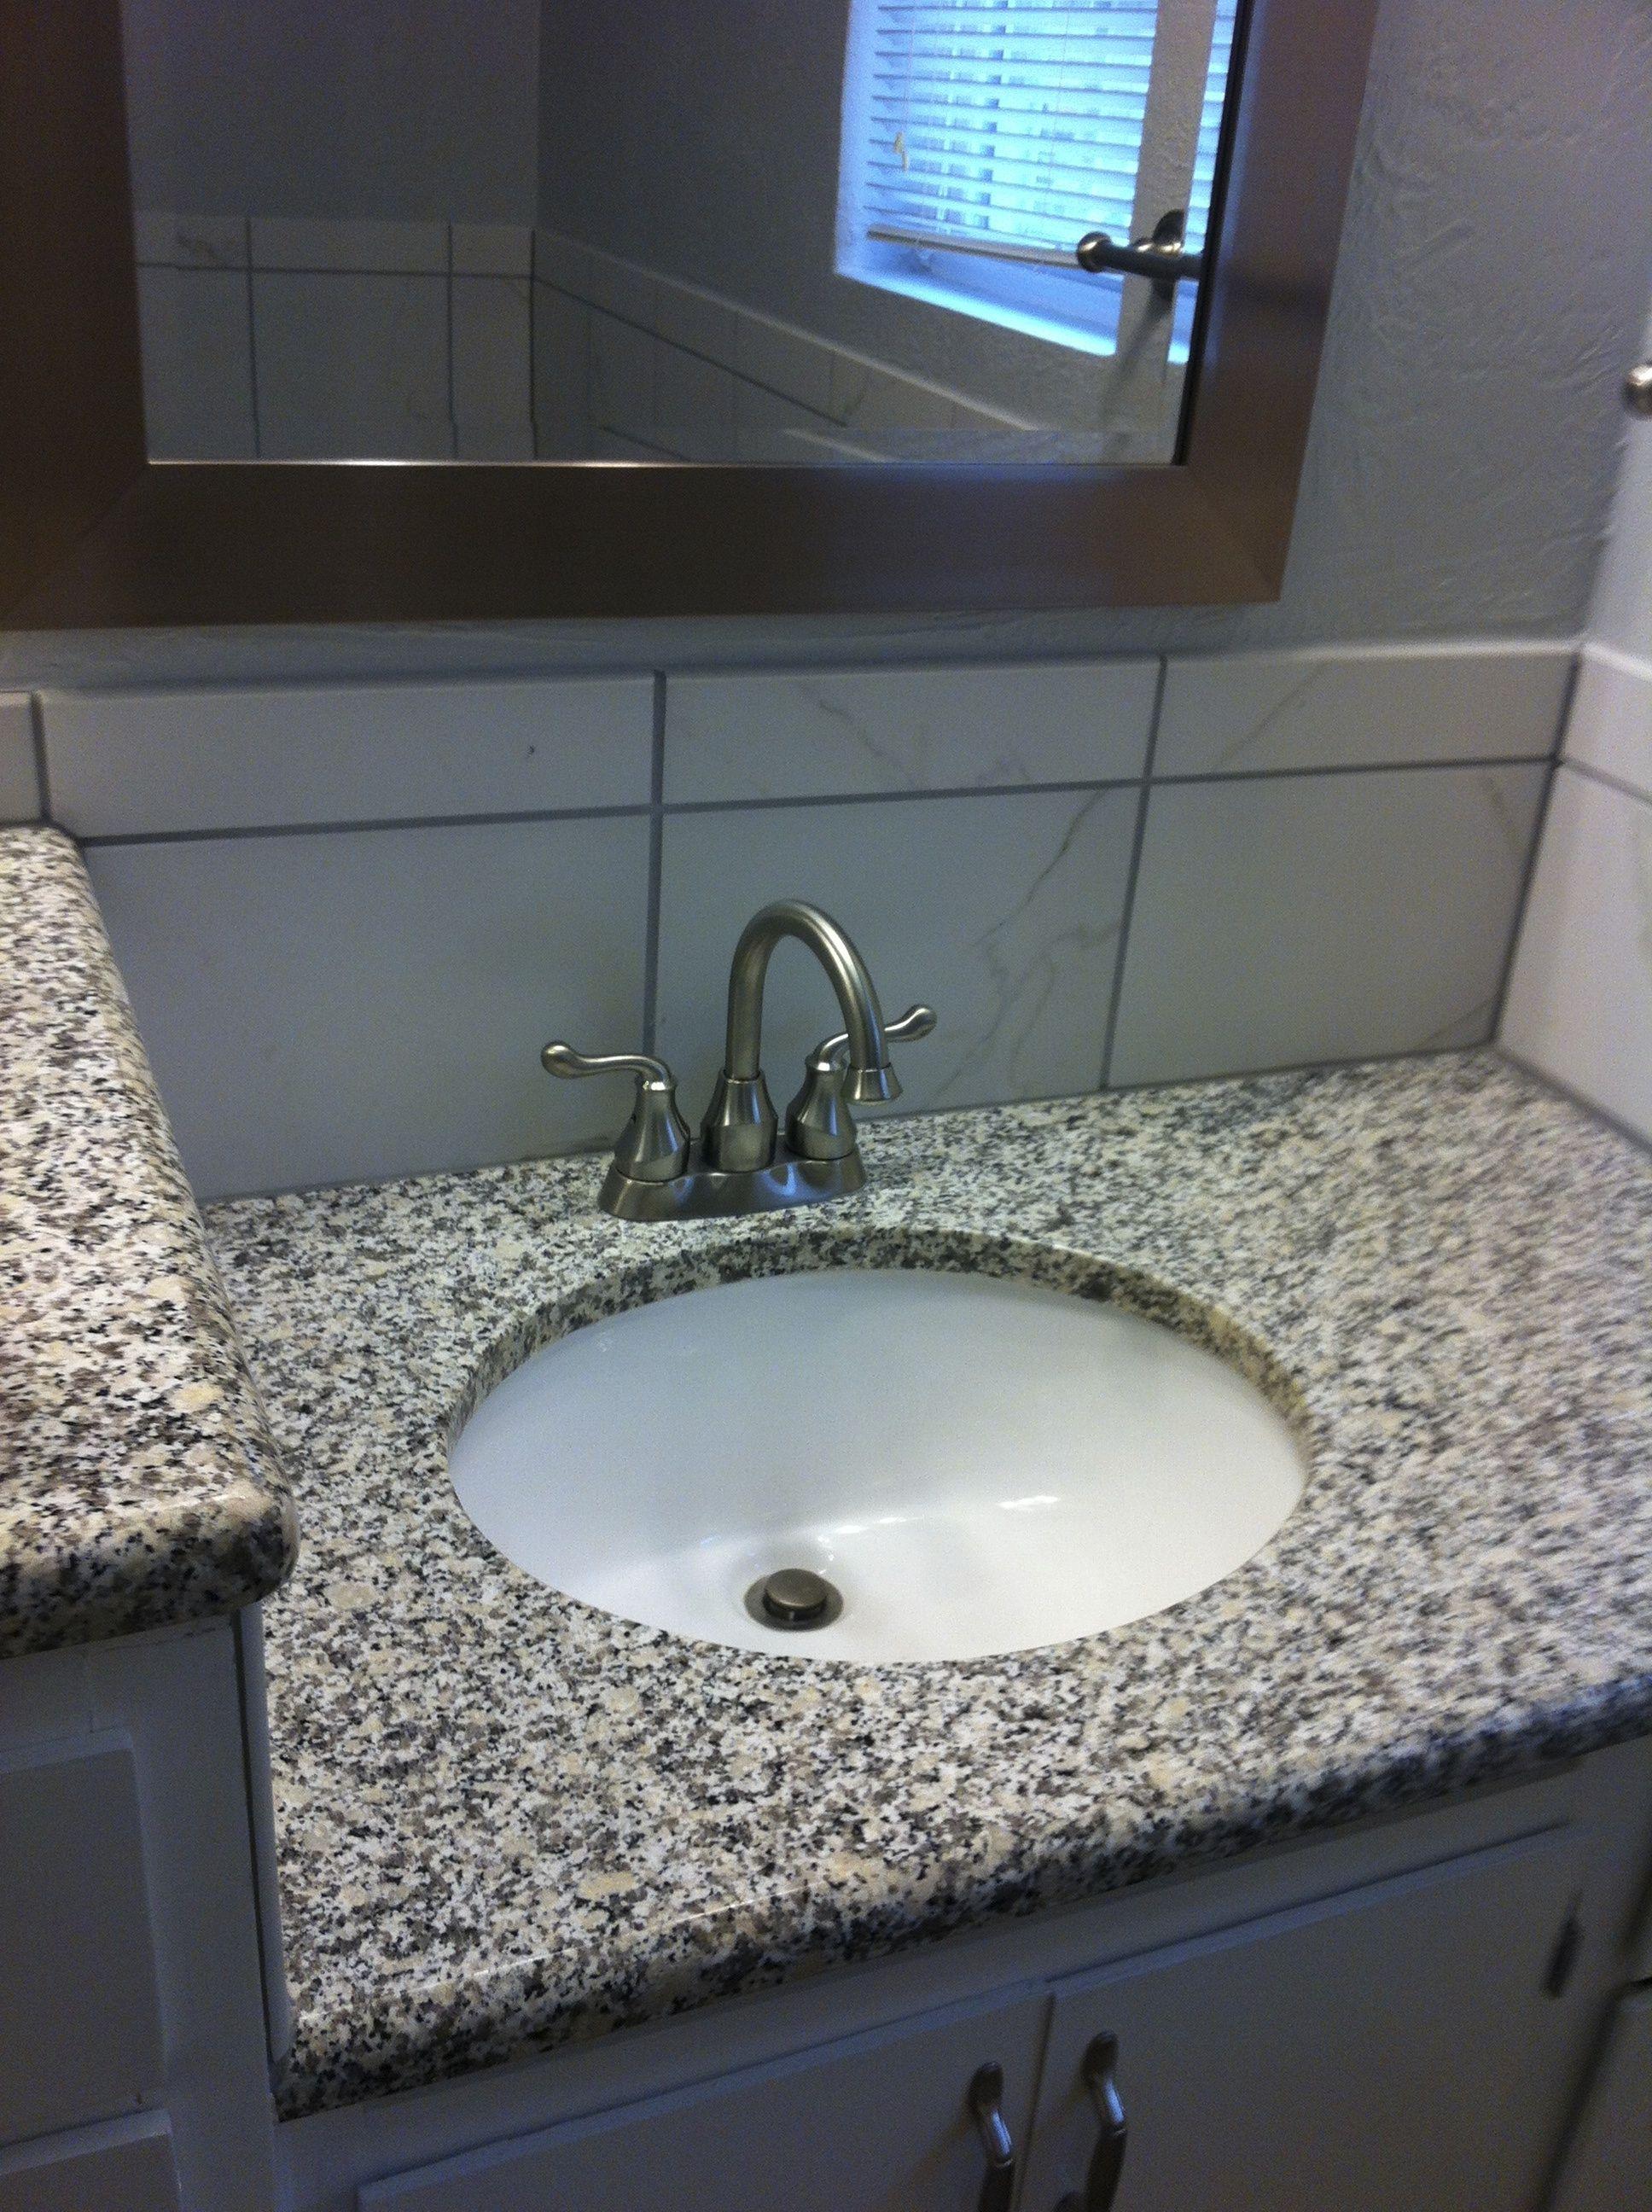 Bathroom Fixtures Grapevine Texas a better home services | grapevine, tx 76150 - homeadvisor